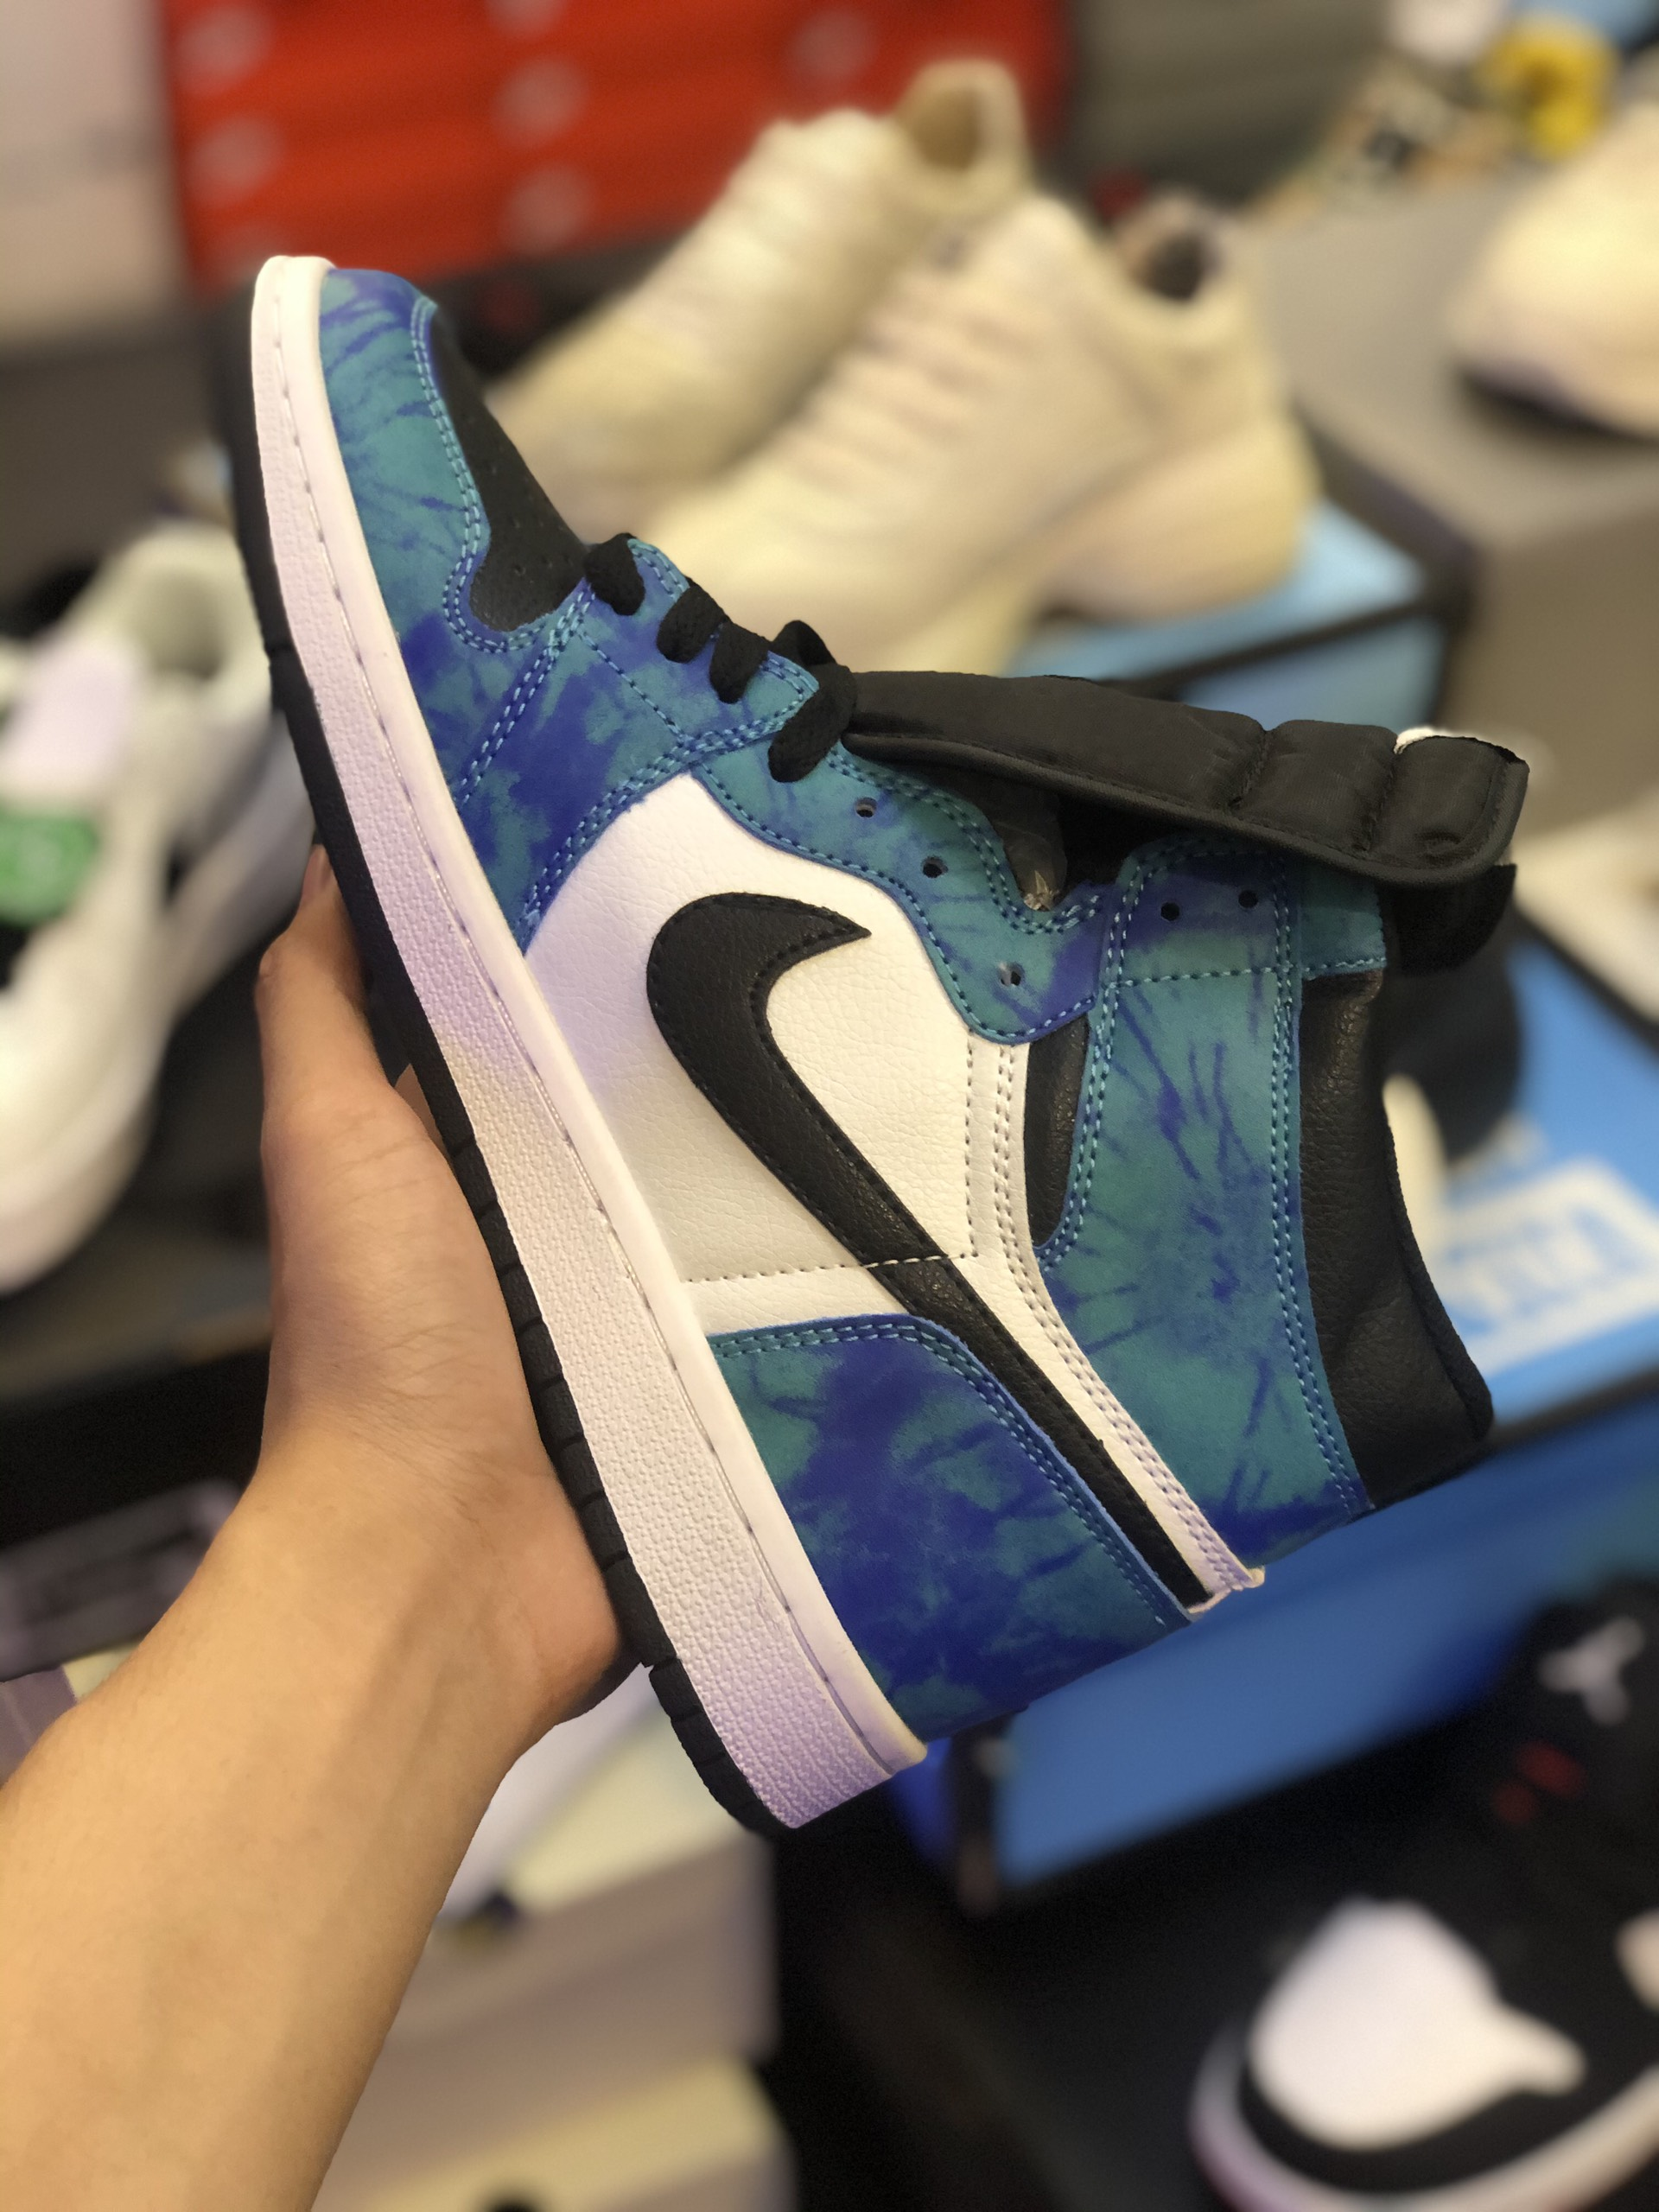 Giày Nike Air Jordan 1 Retro High Tie Dye